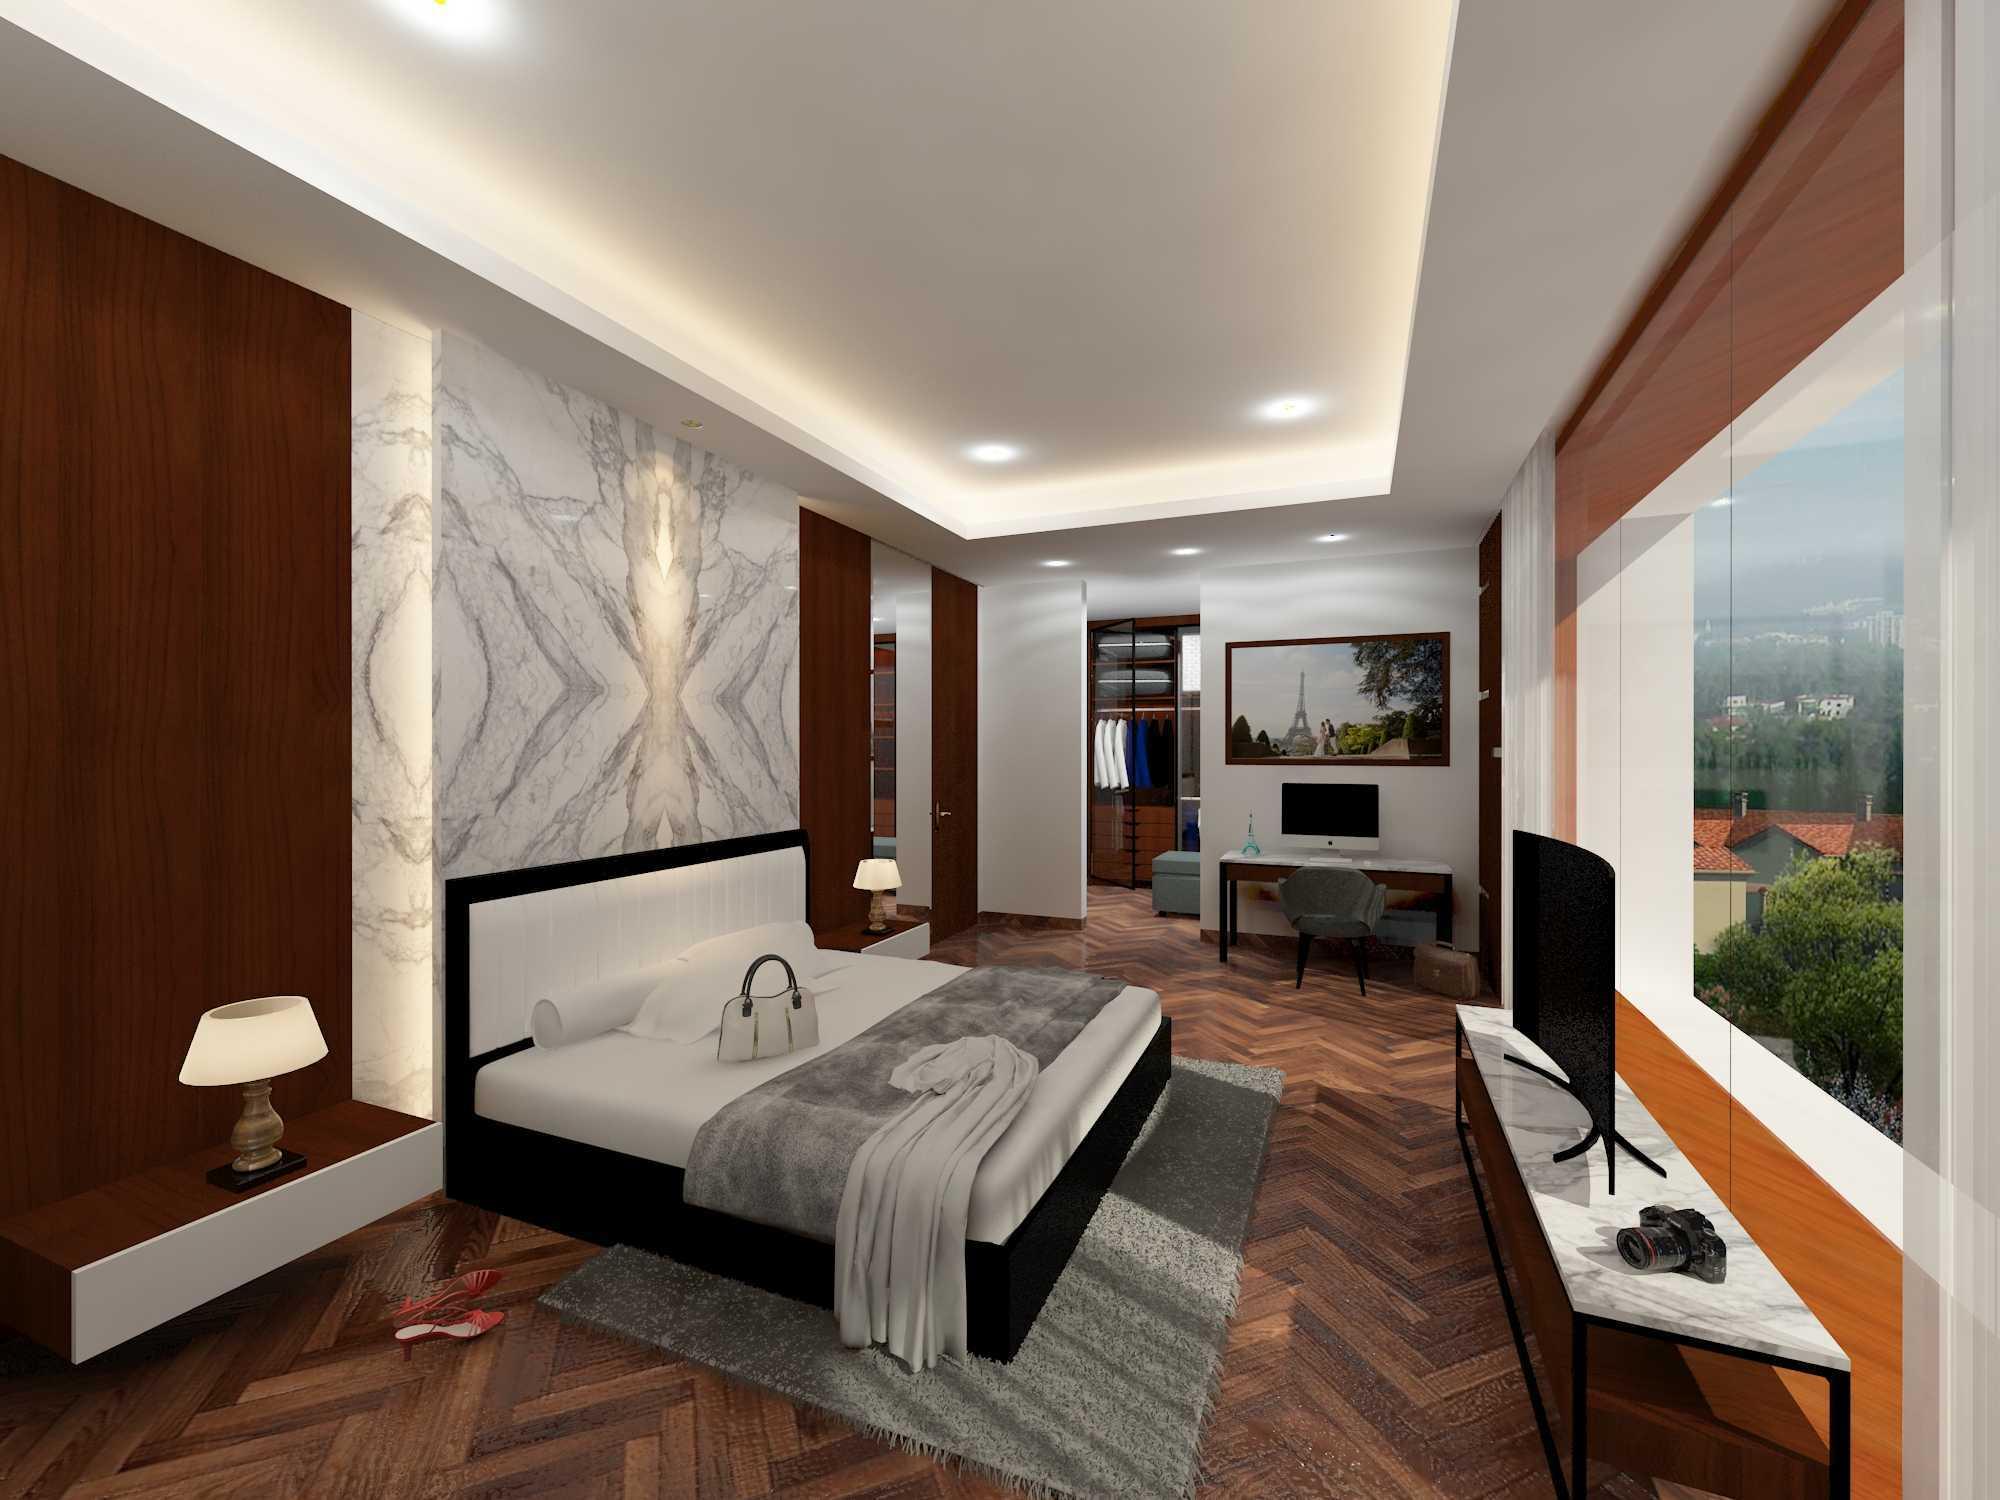 Alima Studio Mr. A's House Jakarta, Indonesia Jakarta, Indonesia Bedroom   27828